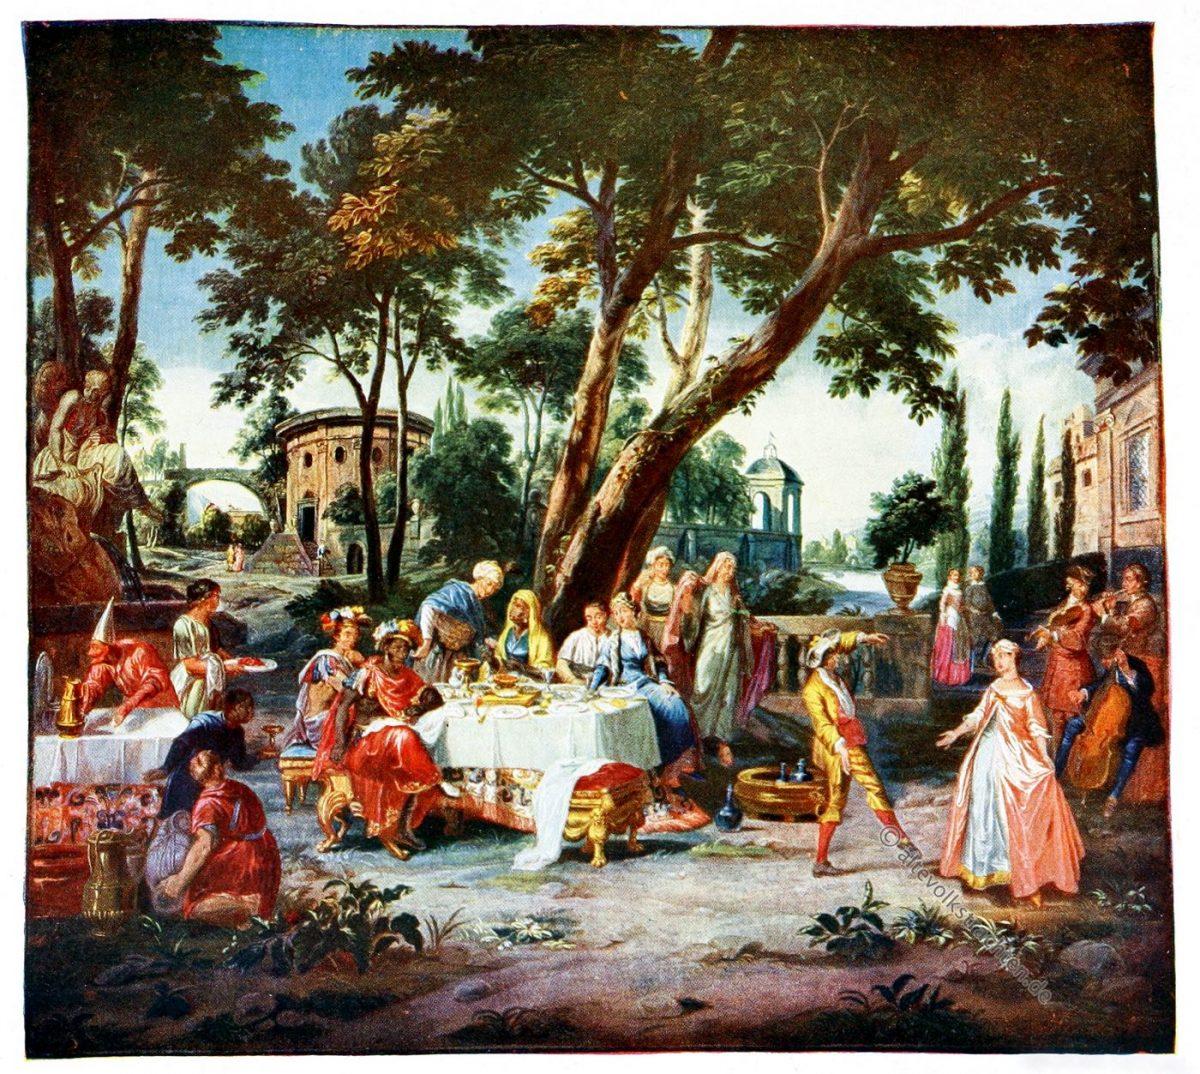 Gobelin, Rokoko, Barock, Gastmahl, Mohrenfürsten, Kunsthistorie, Gobelinsammlung, Gobelins, 18. Jahrhundert,